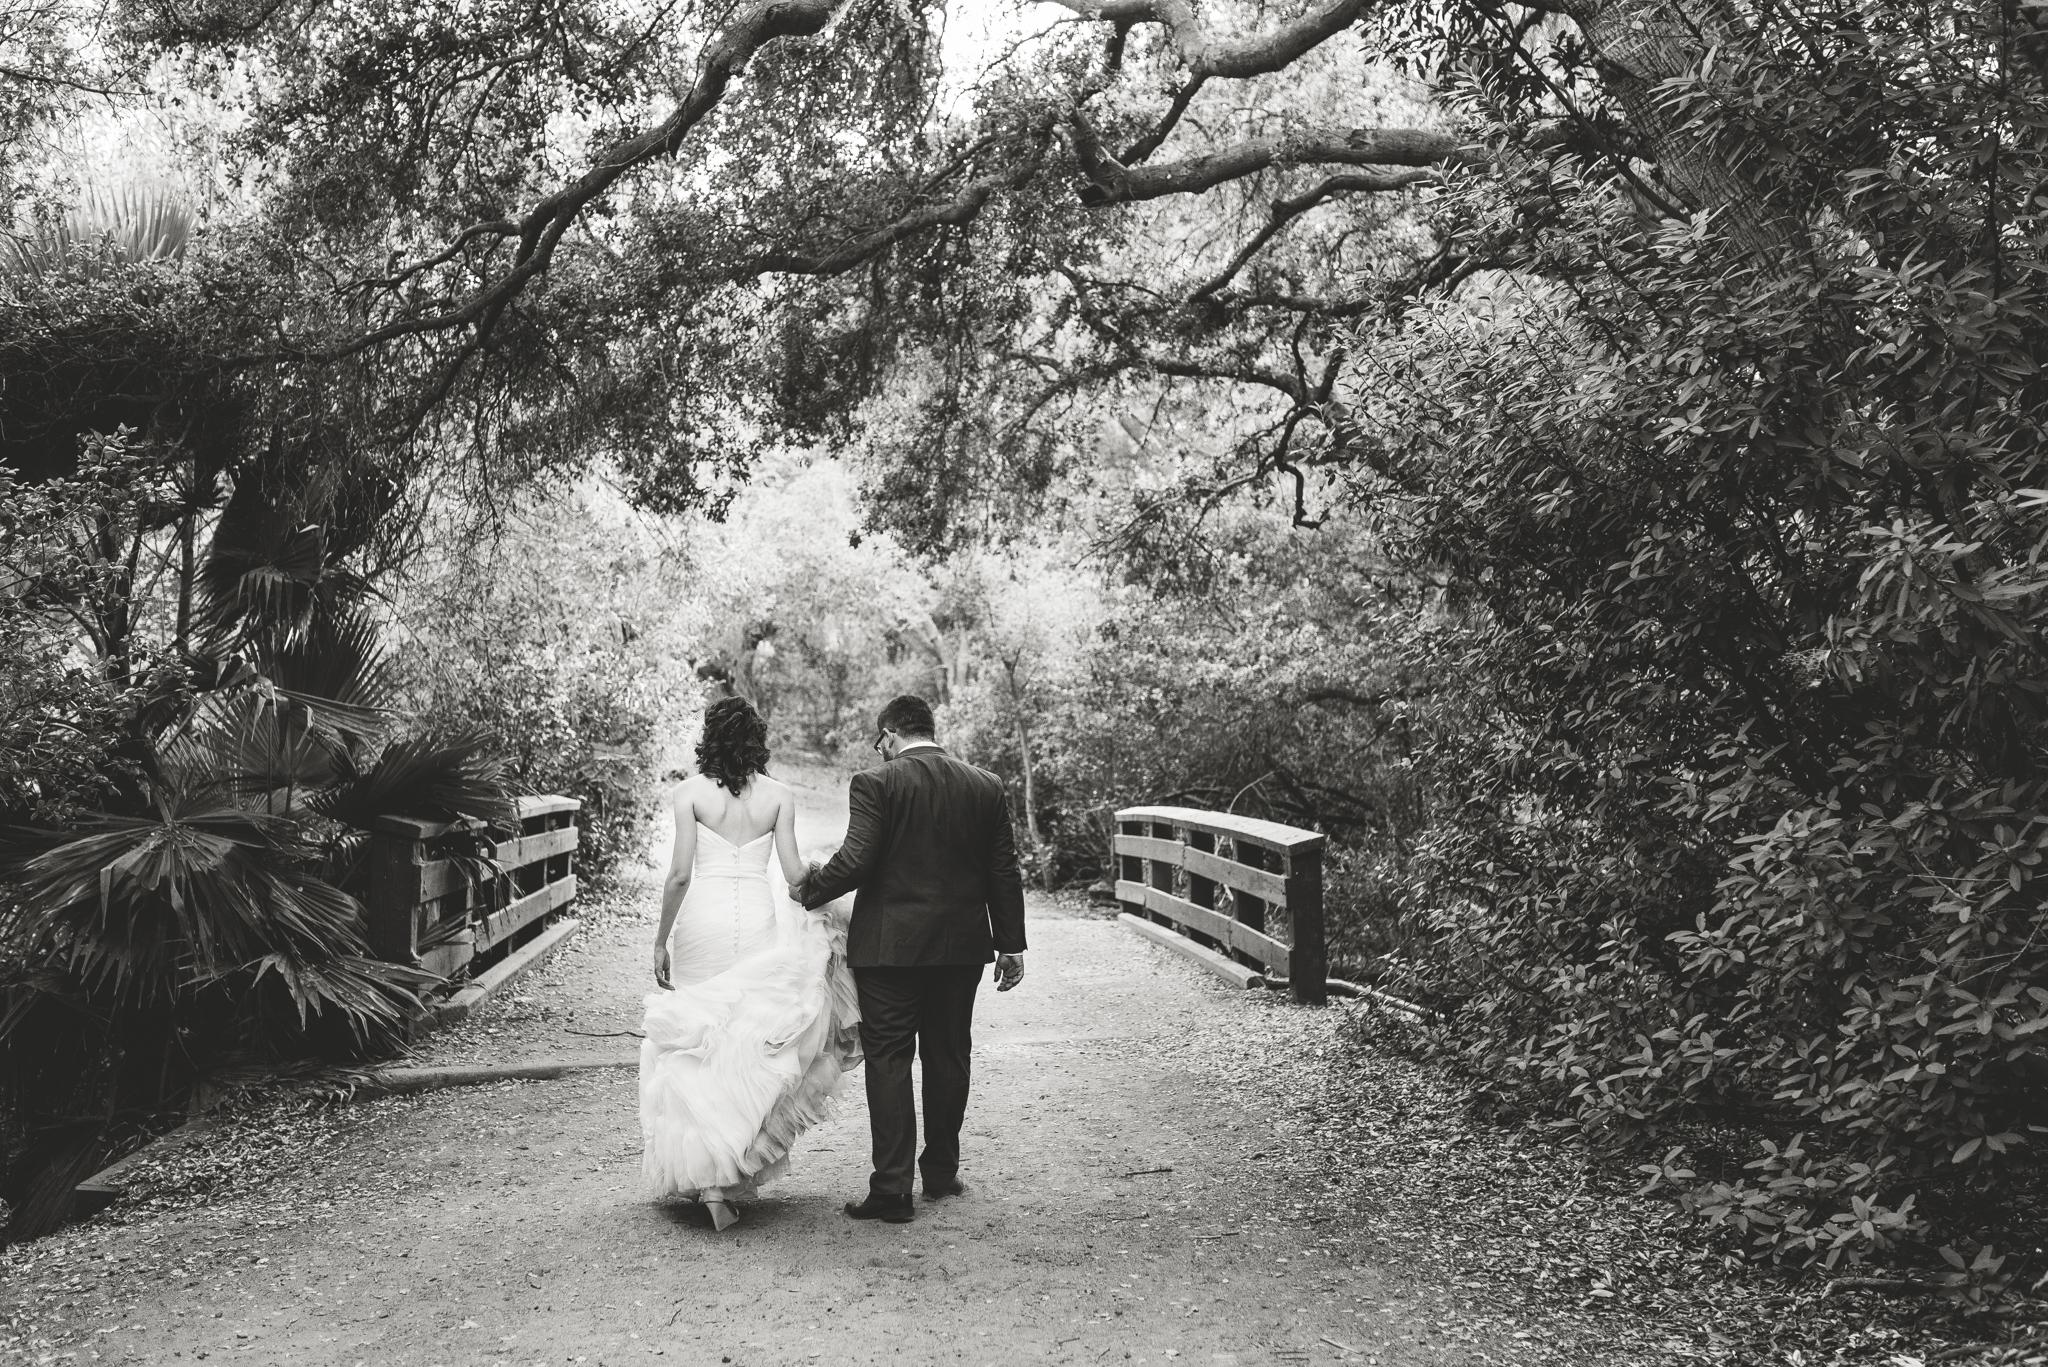 Isaiah & Taylor Photography - Los Angeles Lifestyle Wedding Photographer-31.jpg